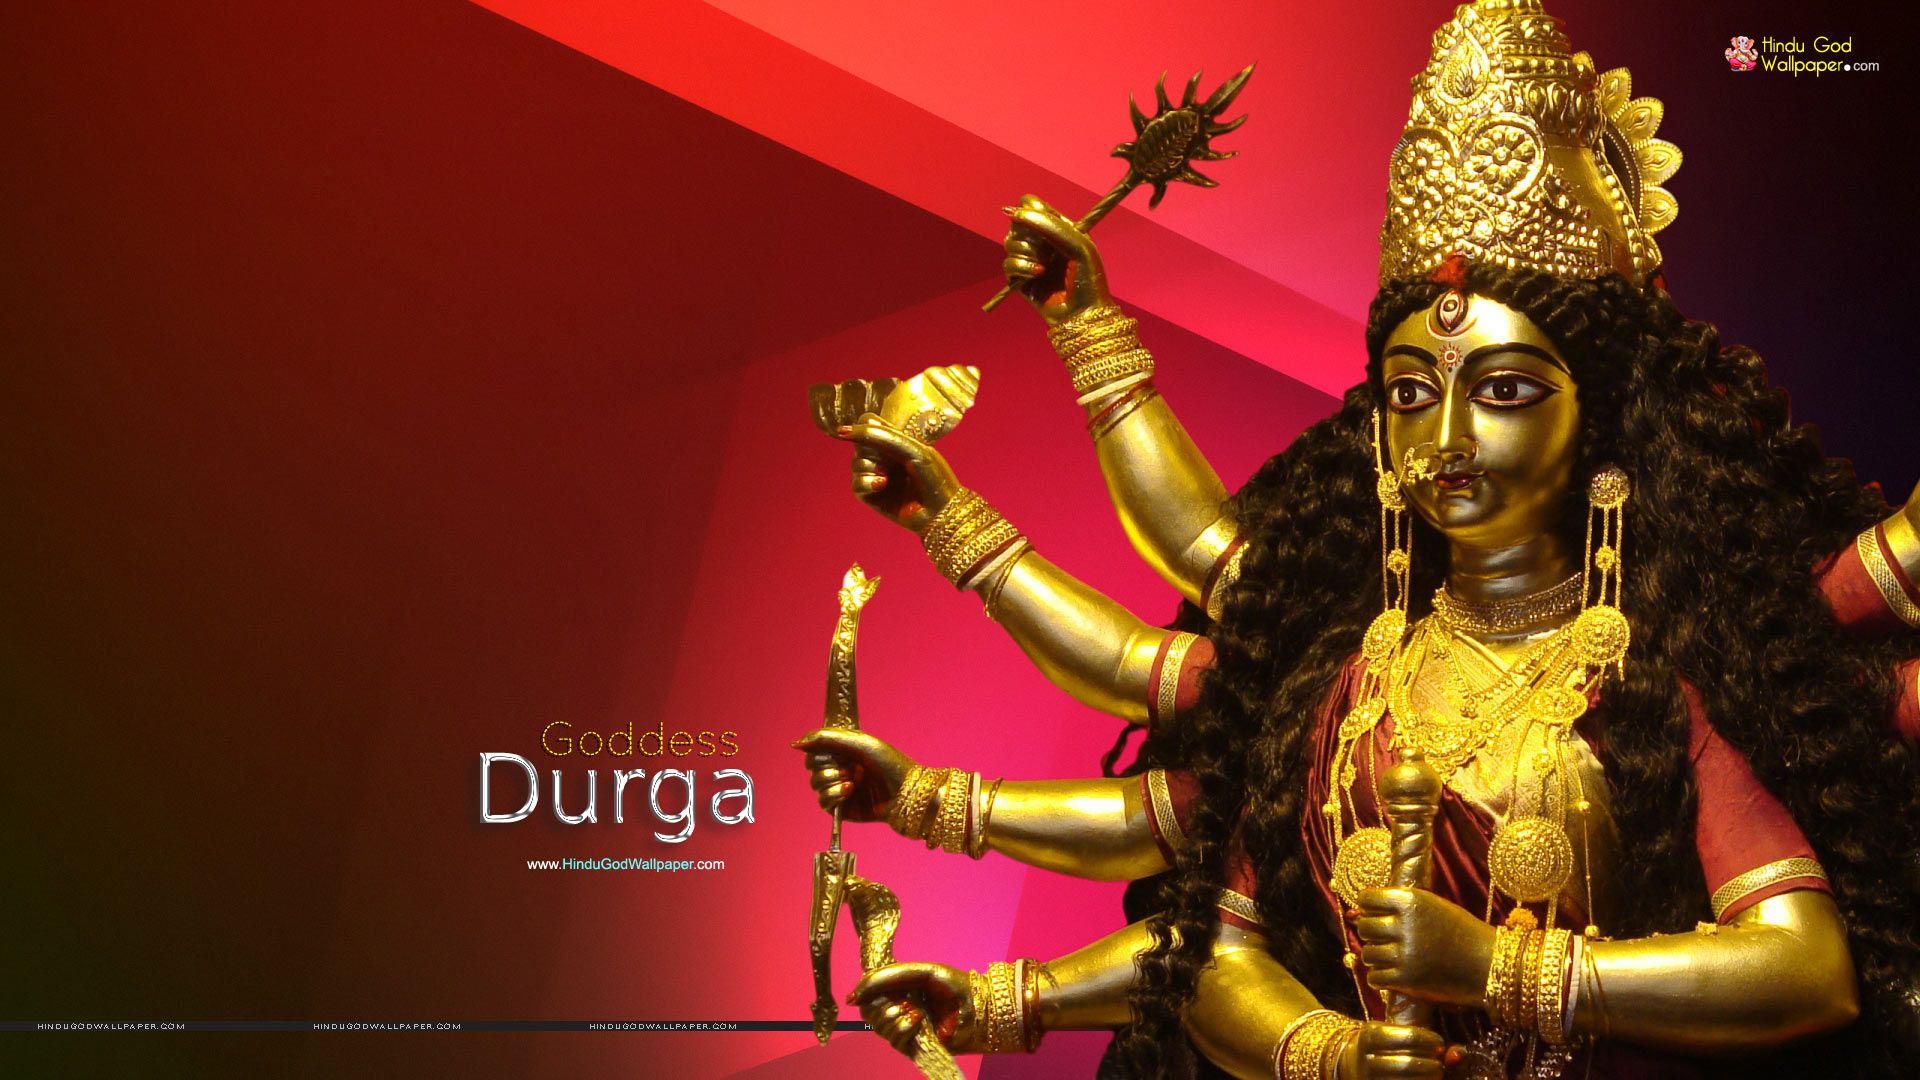 Durga Puja Hd Wallpaper For Desktop Maa Durga Hd Wallpapers Maa